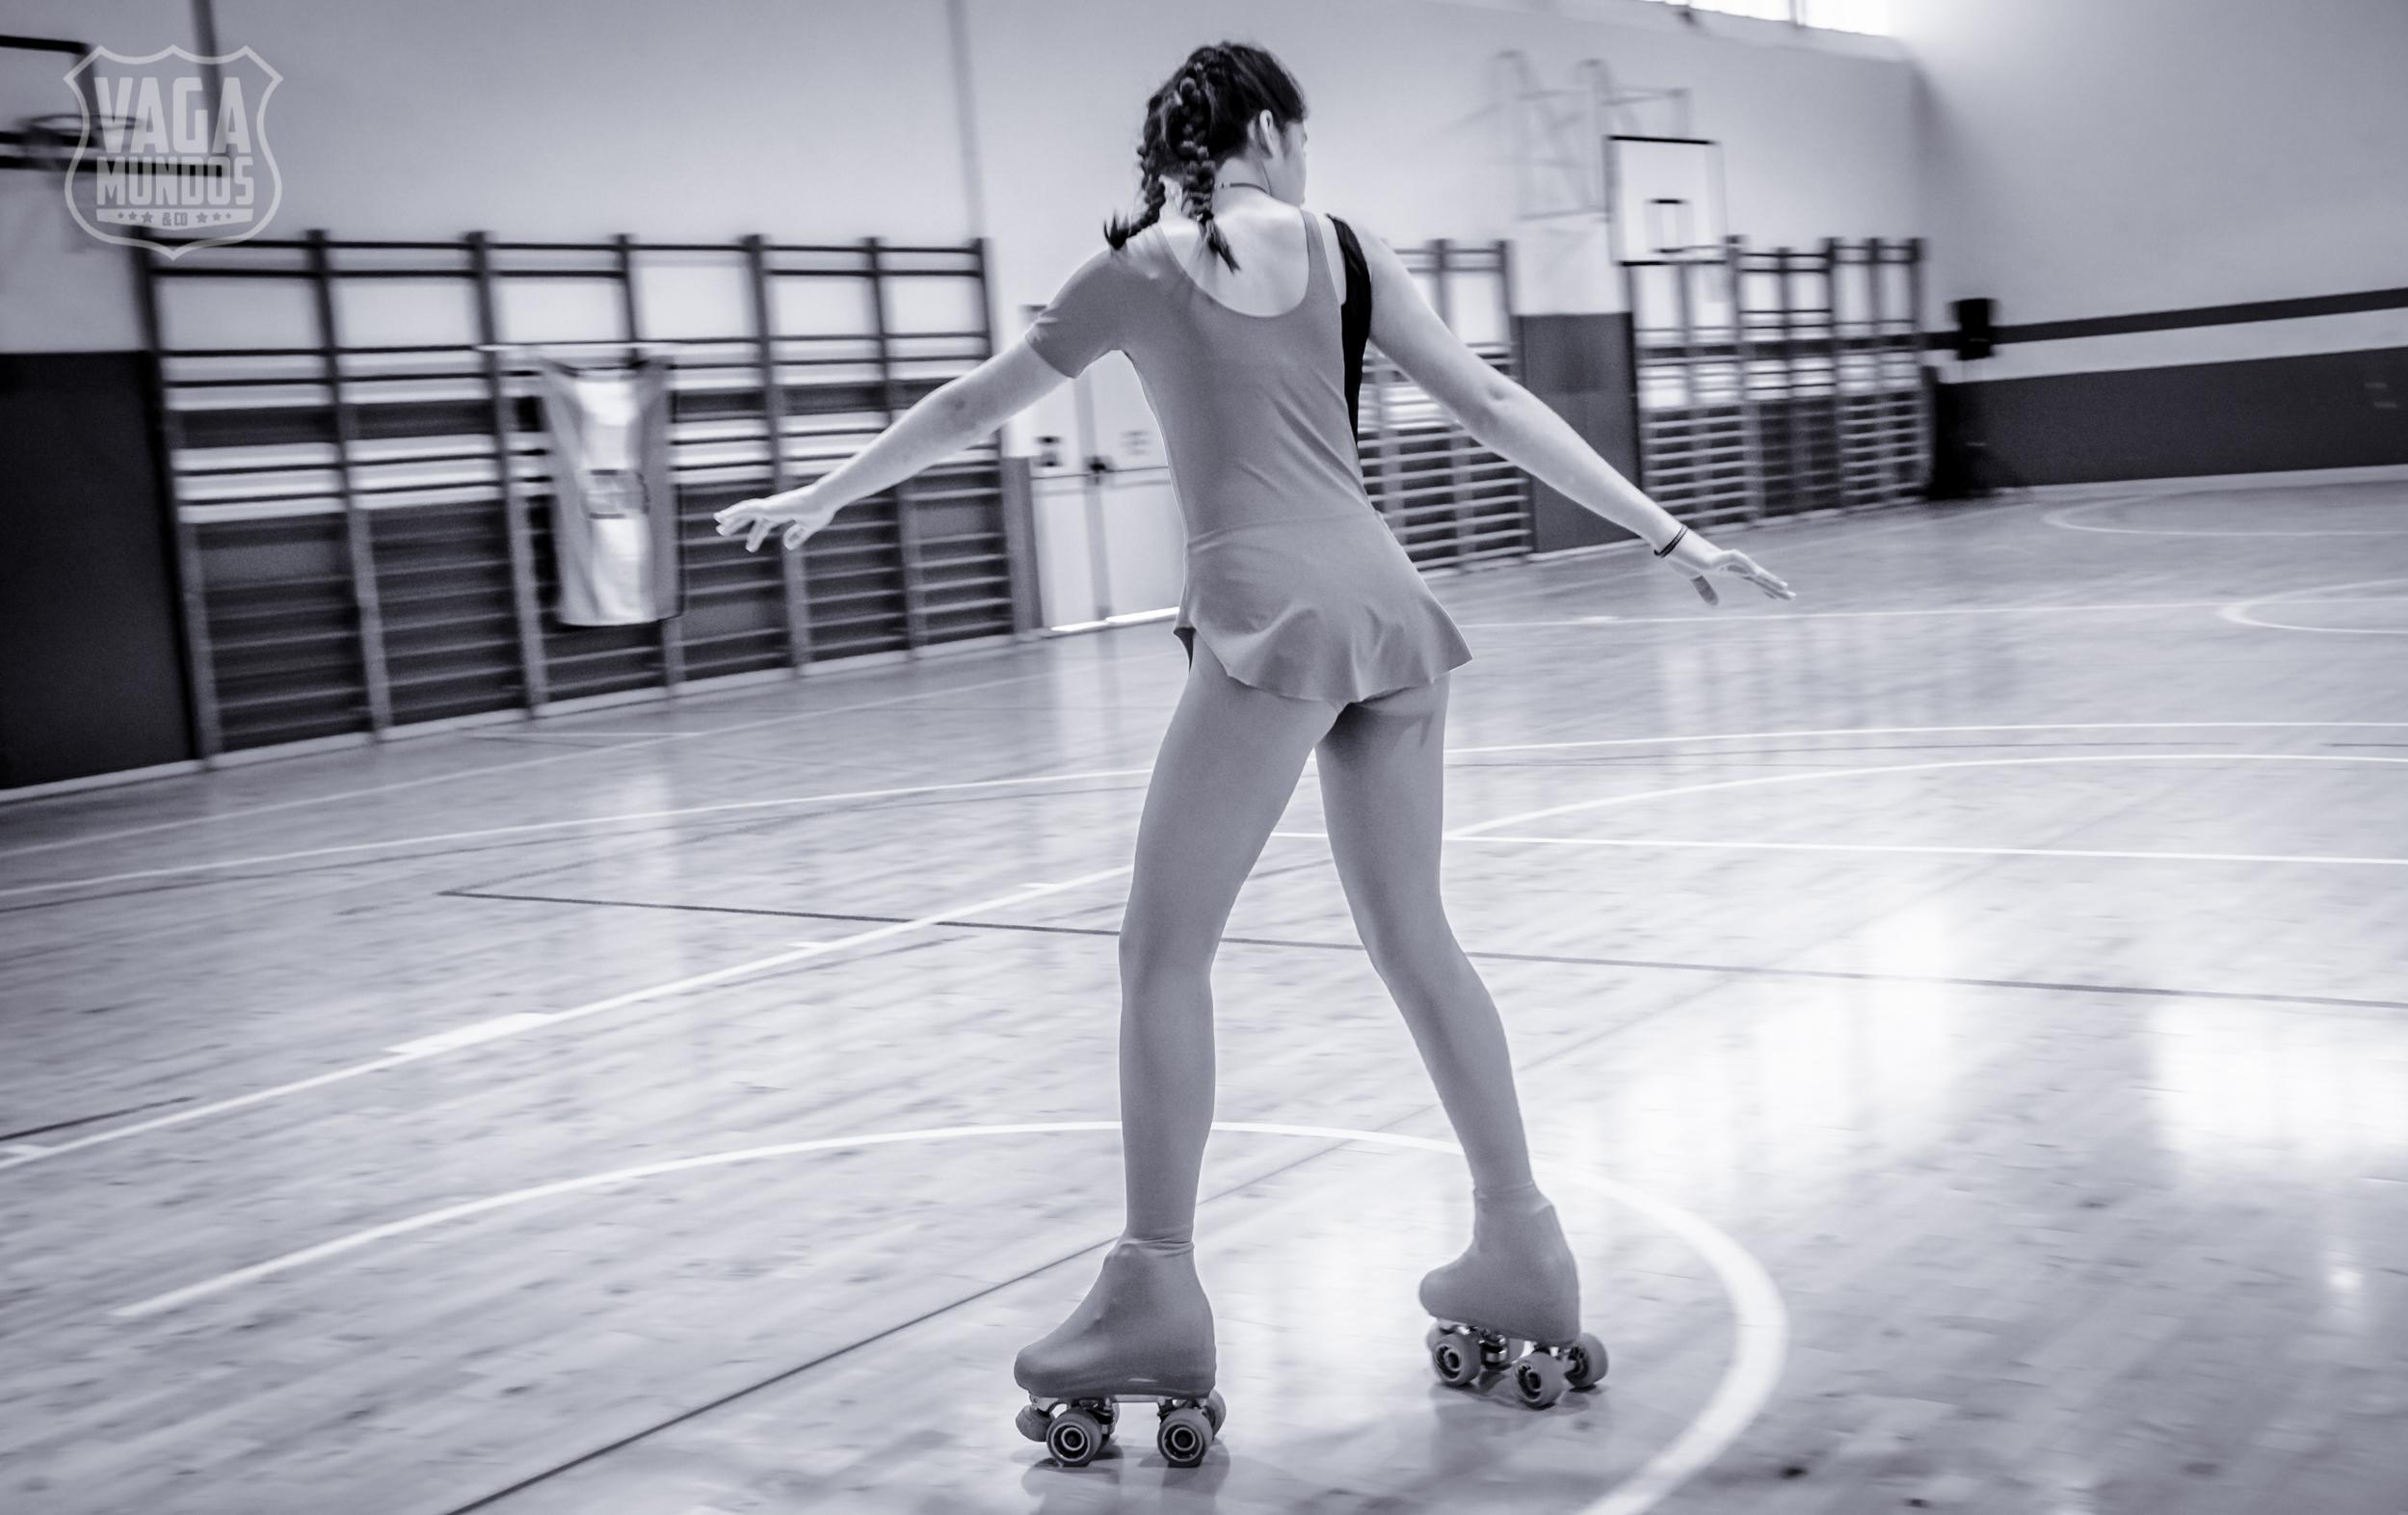 torrelodones patinaje2.JPG